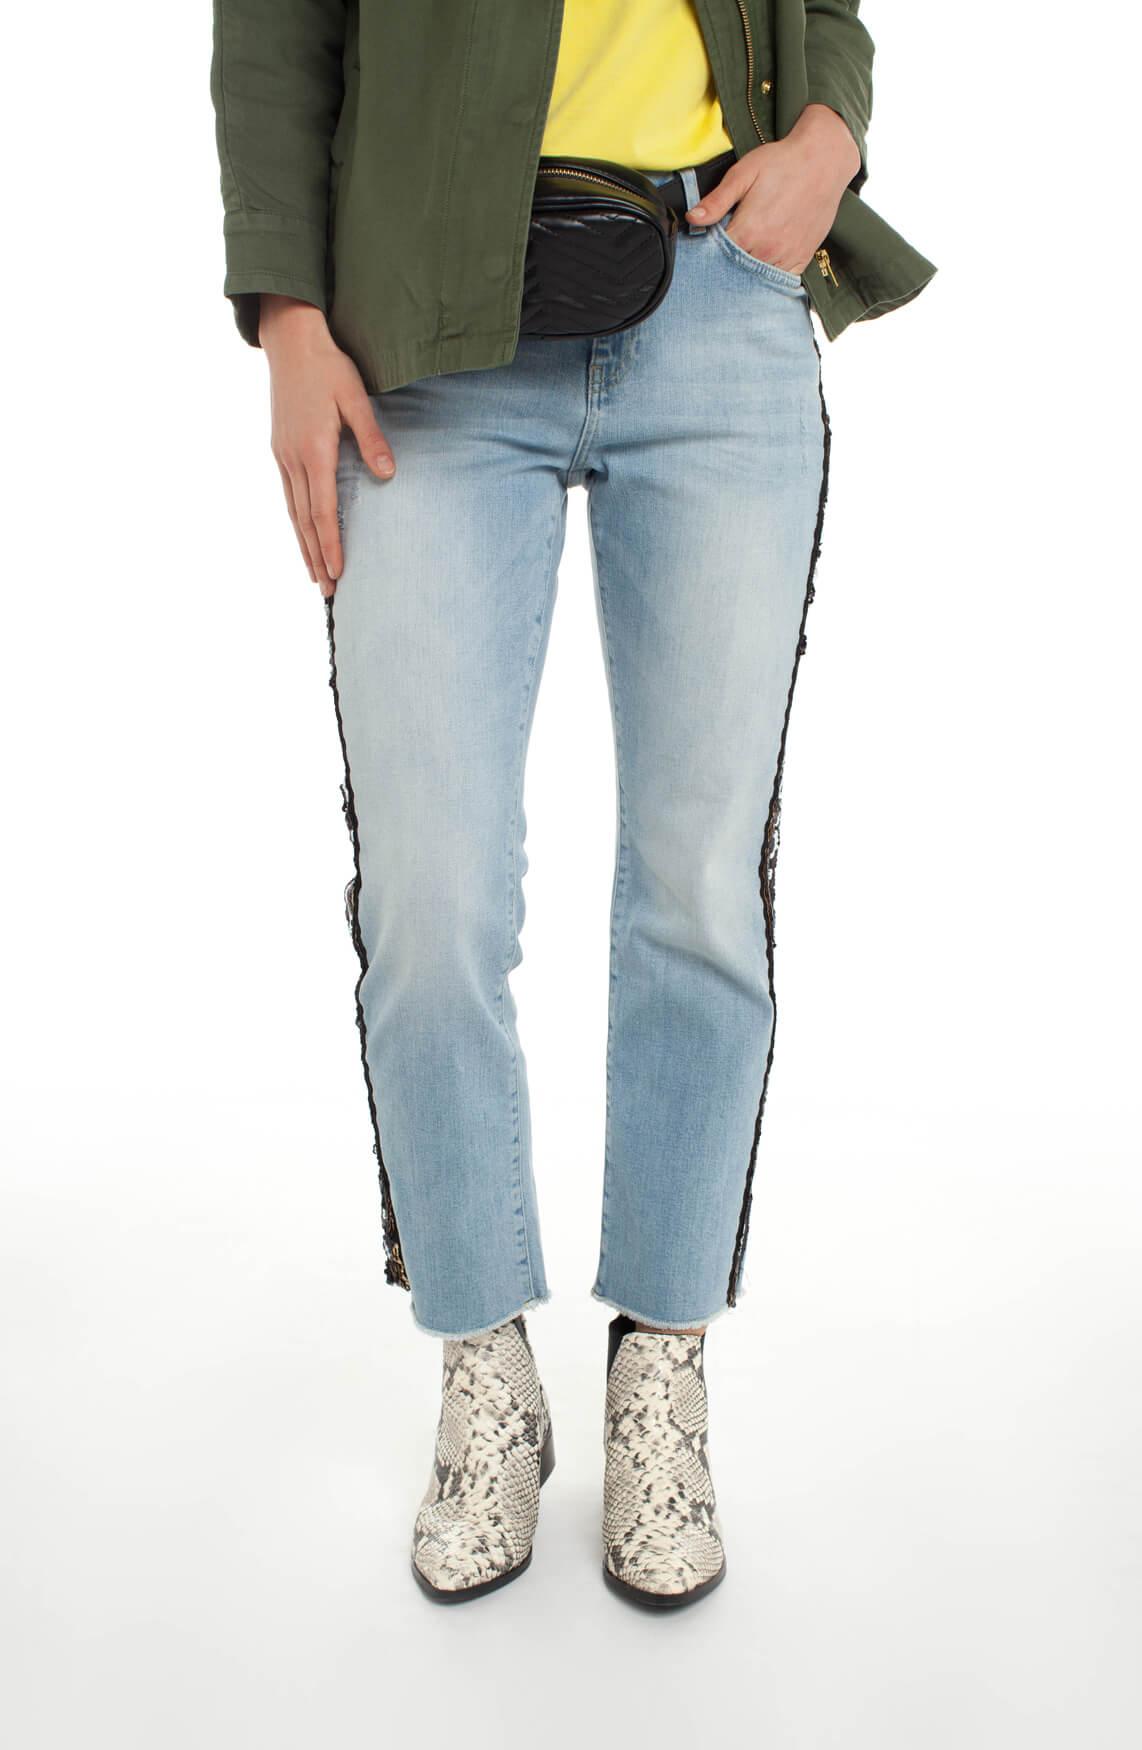 Mos Mosh Dames Sunn jeans met pailletten Blauw